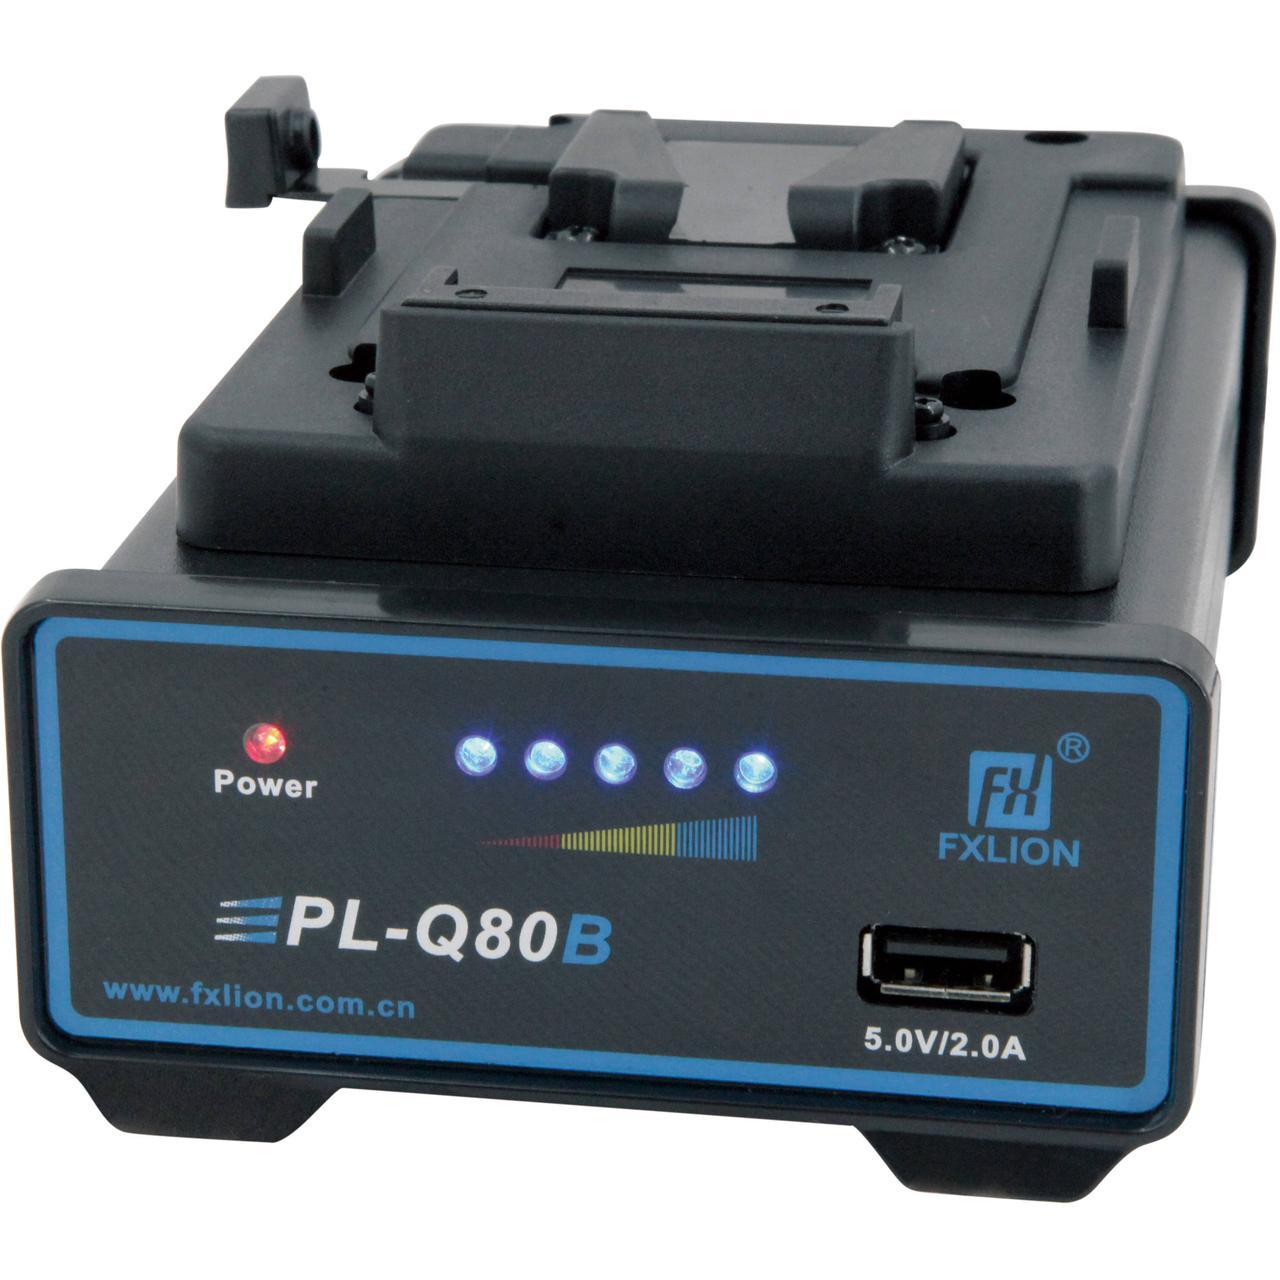 Зарядное устройство FXlion PL-Q80B  V-Mount Charger (PL-Q80B)